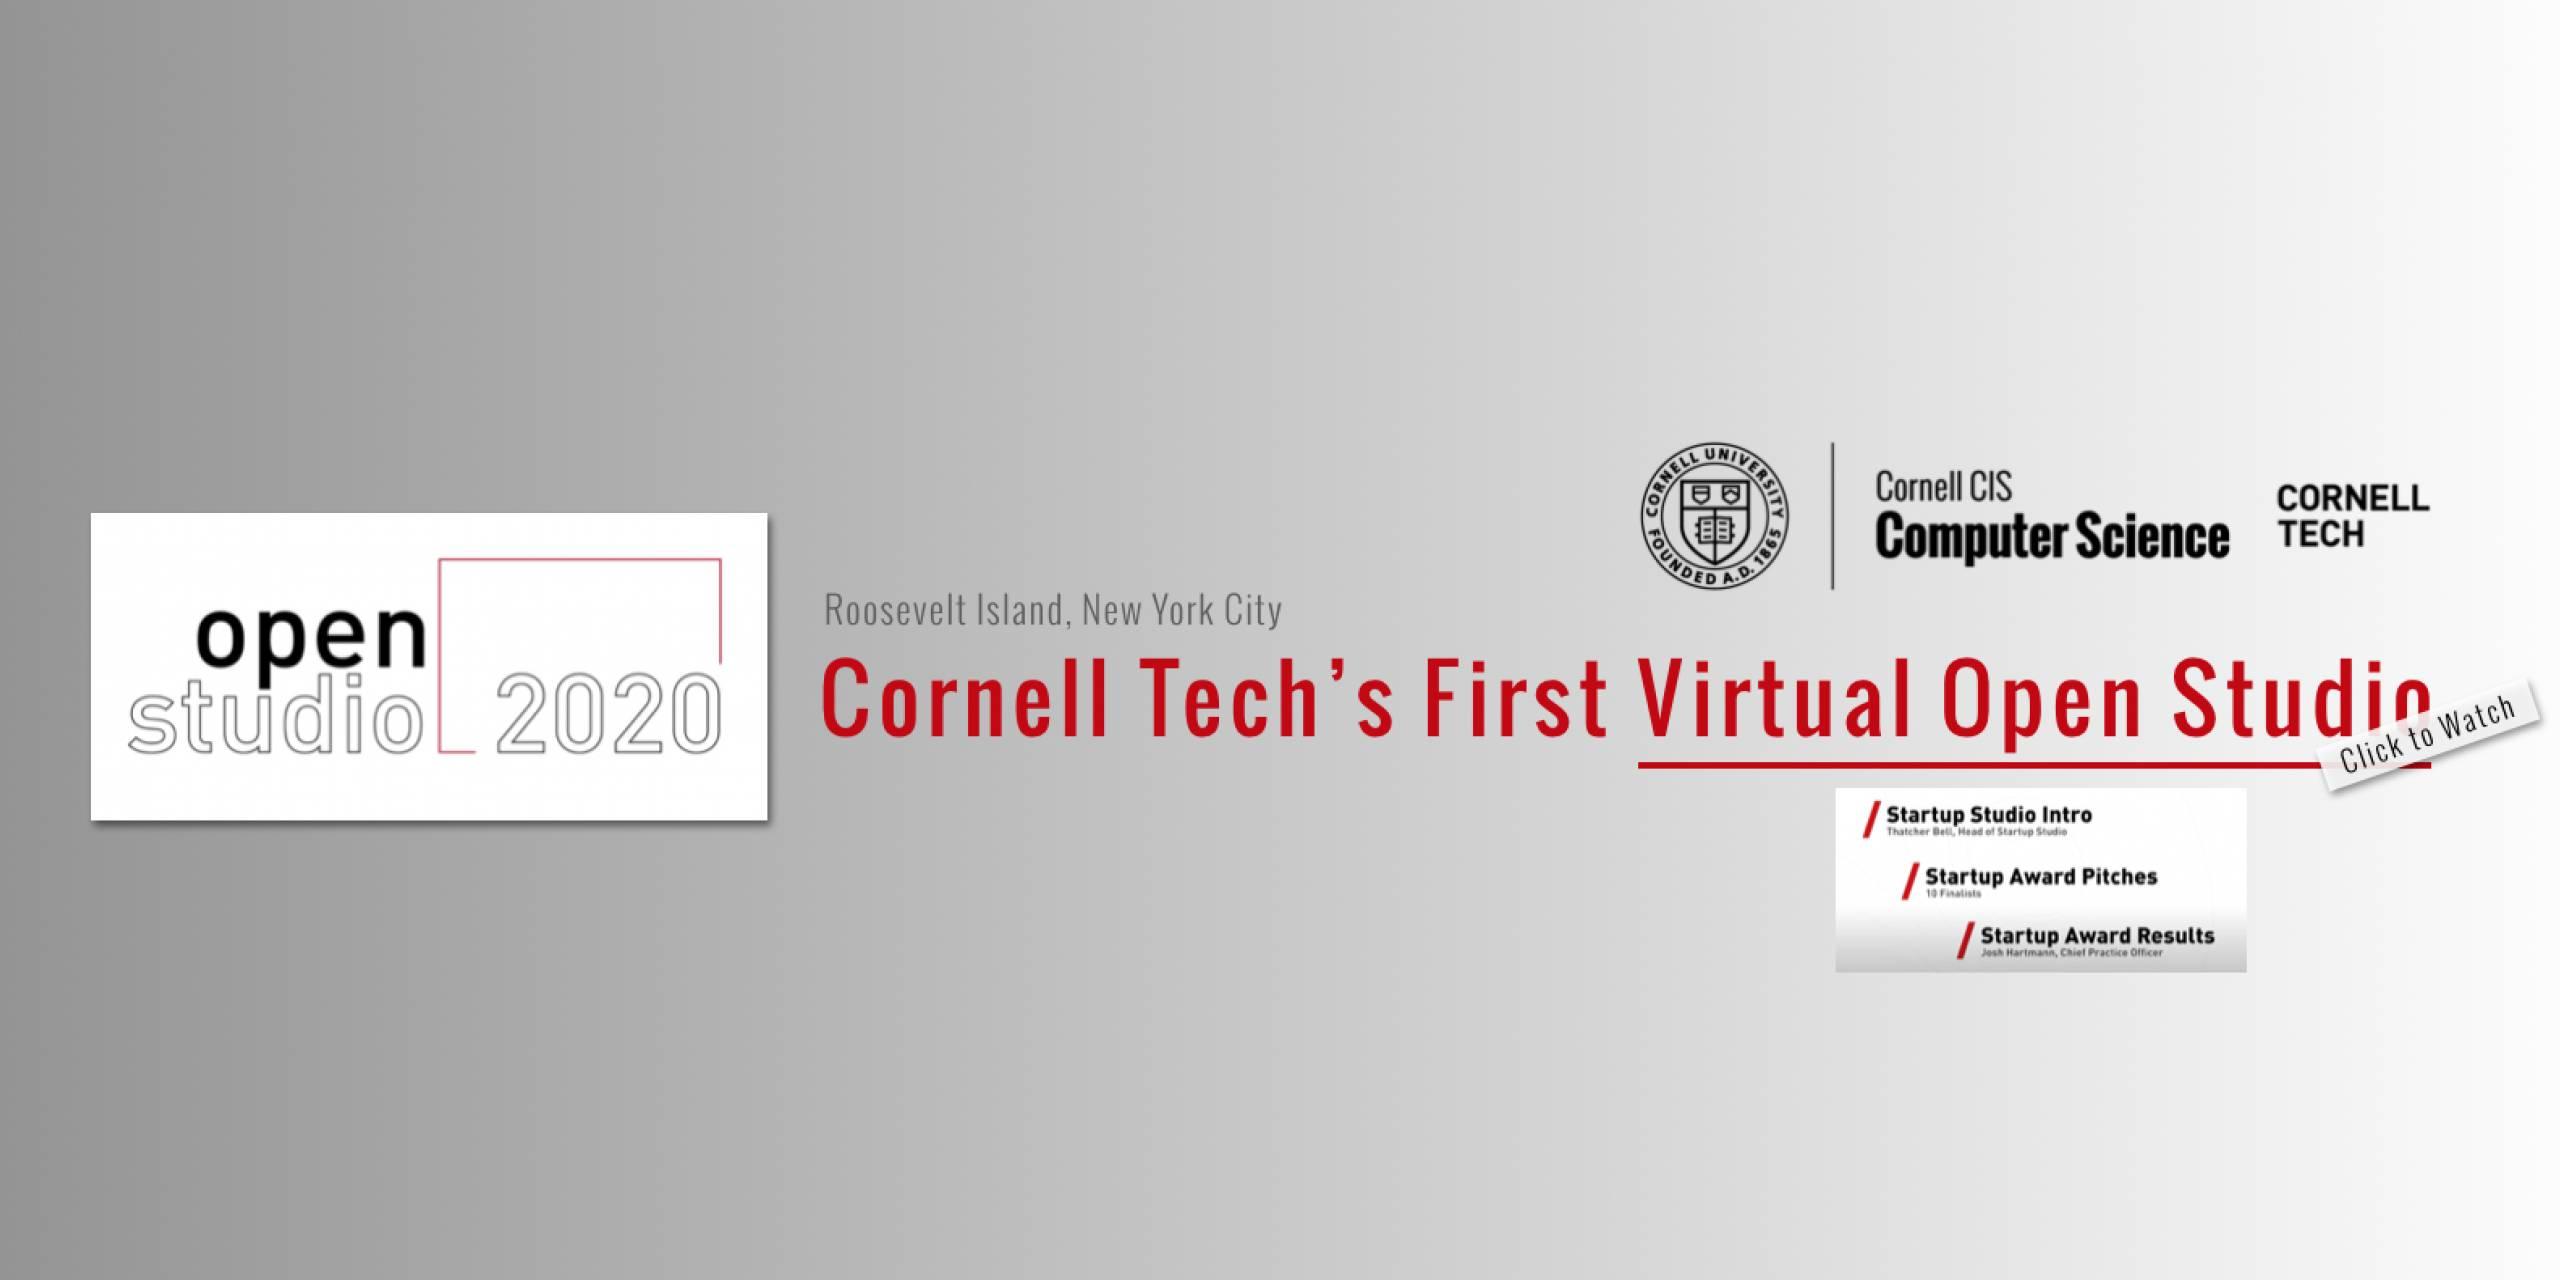 Cornell Tech's First Virtual Open Studio